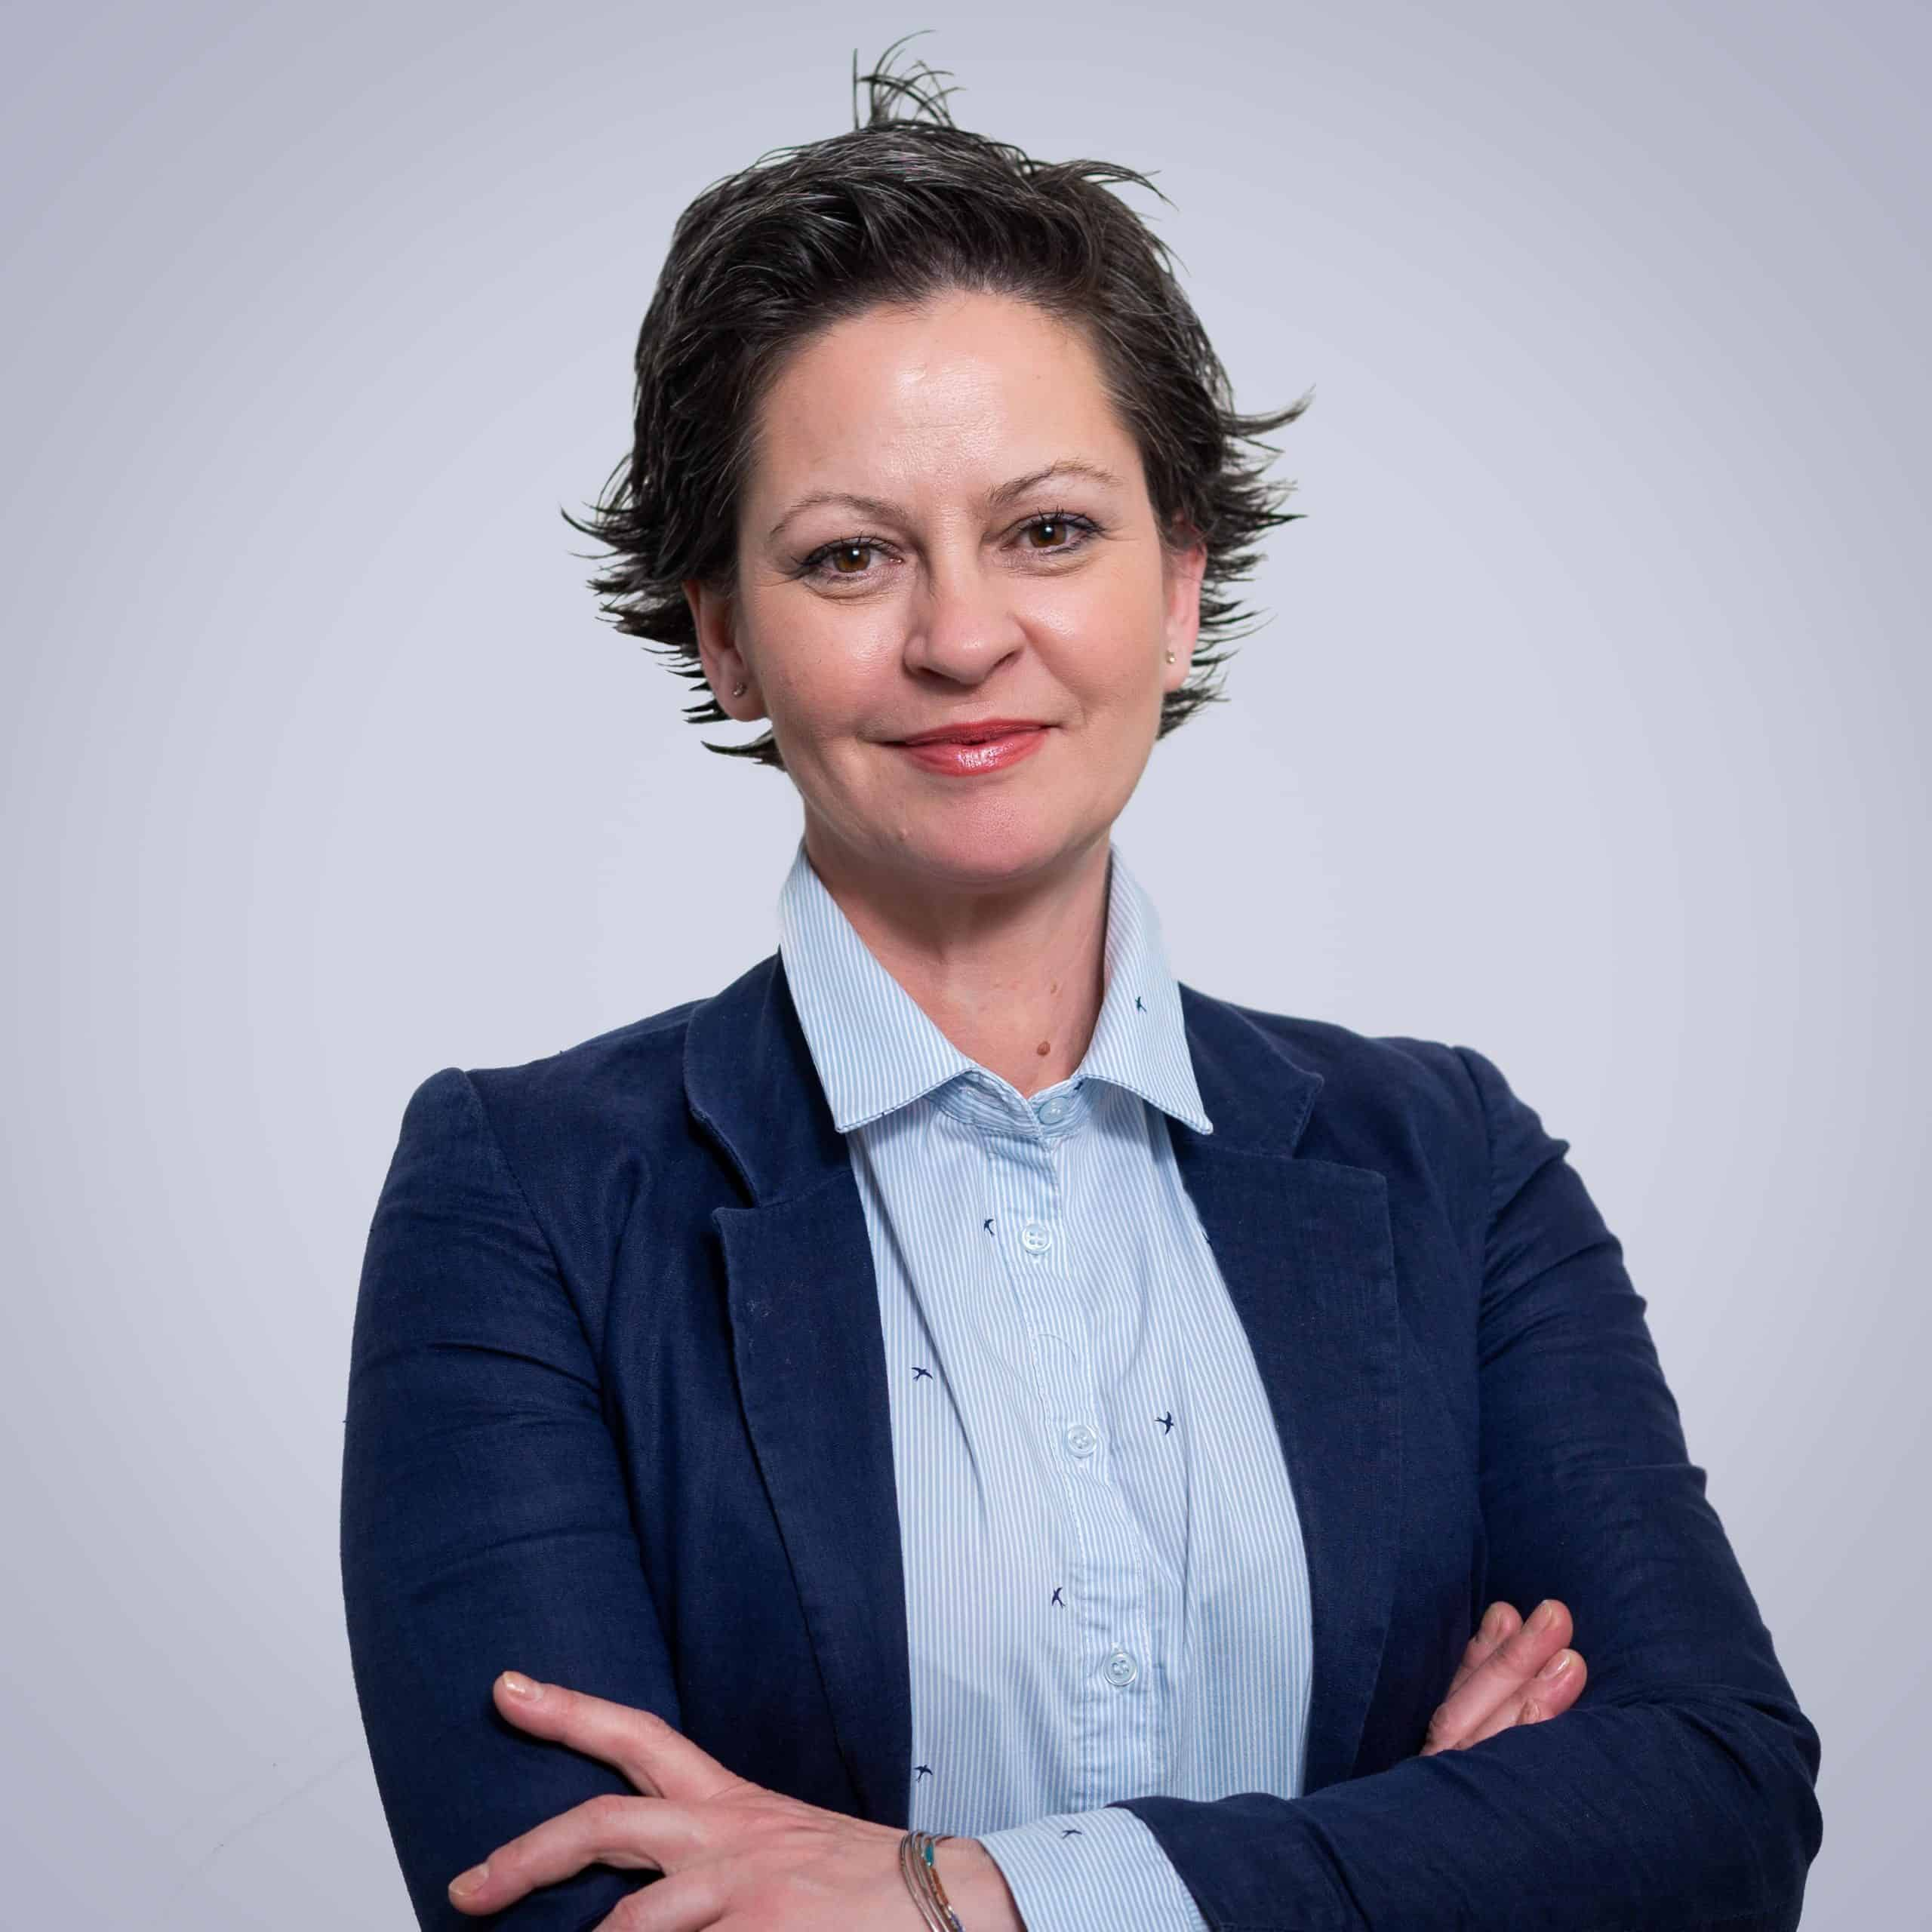 Advokat Beograd, Milosevic Law Firm, Advokatska Kancelarija Milosević